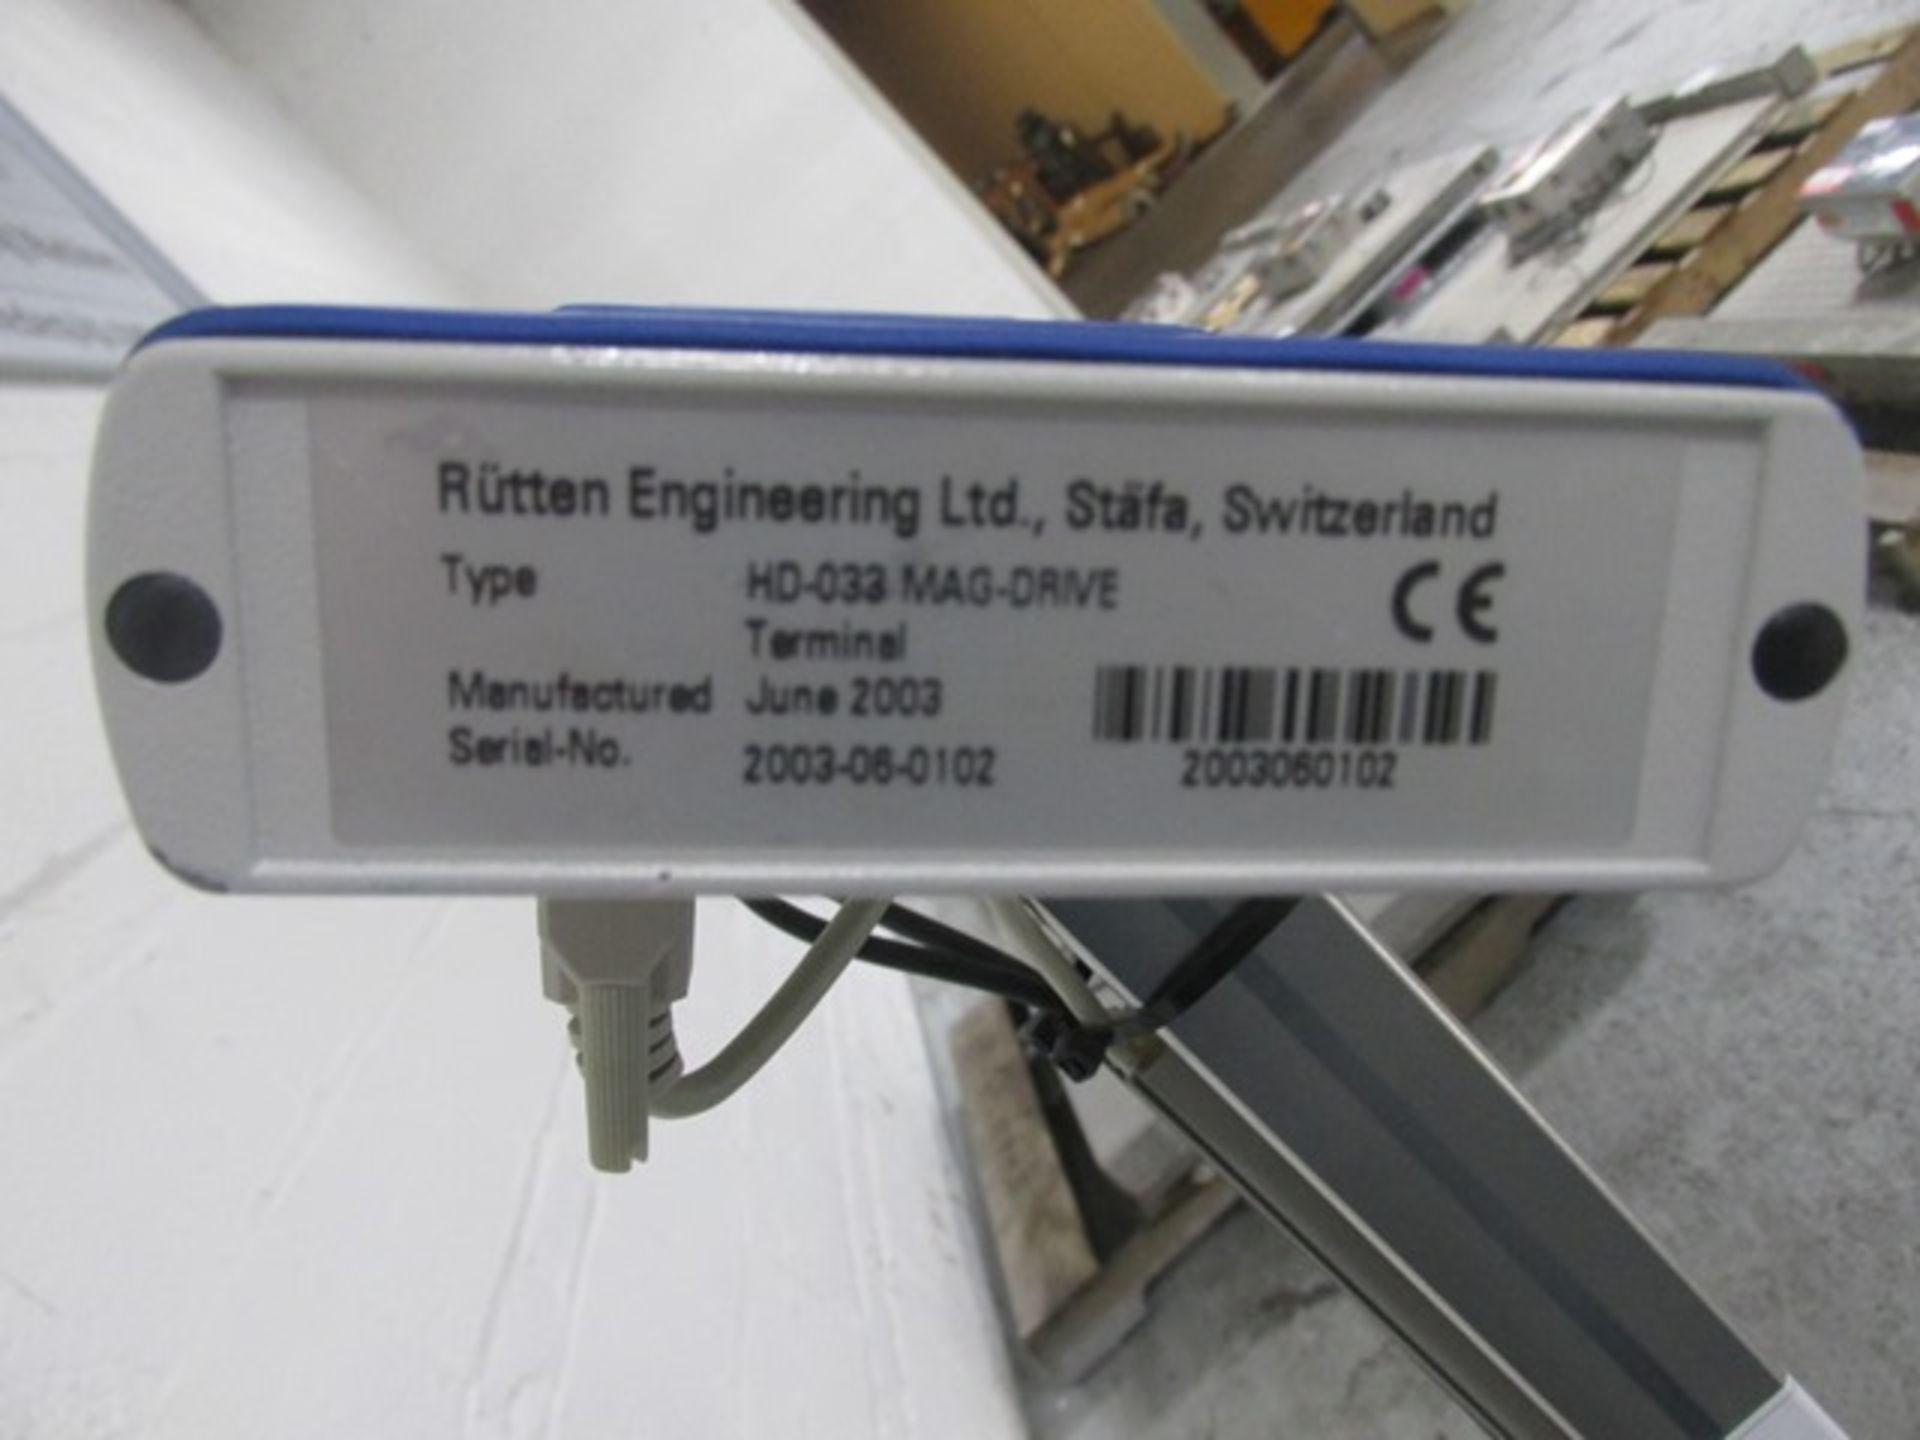 Lot 28 - Rutten Engineering magnetic mixer, model HD-033 MAG-DRIVE